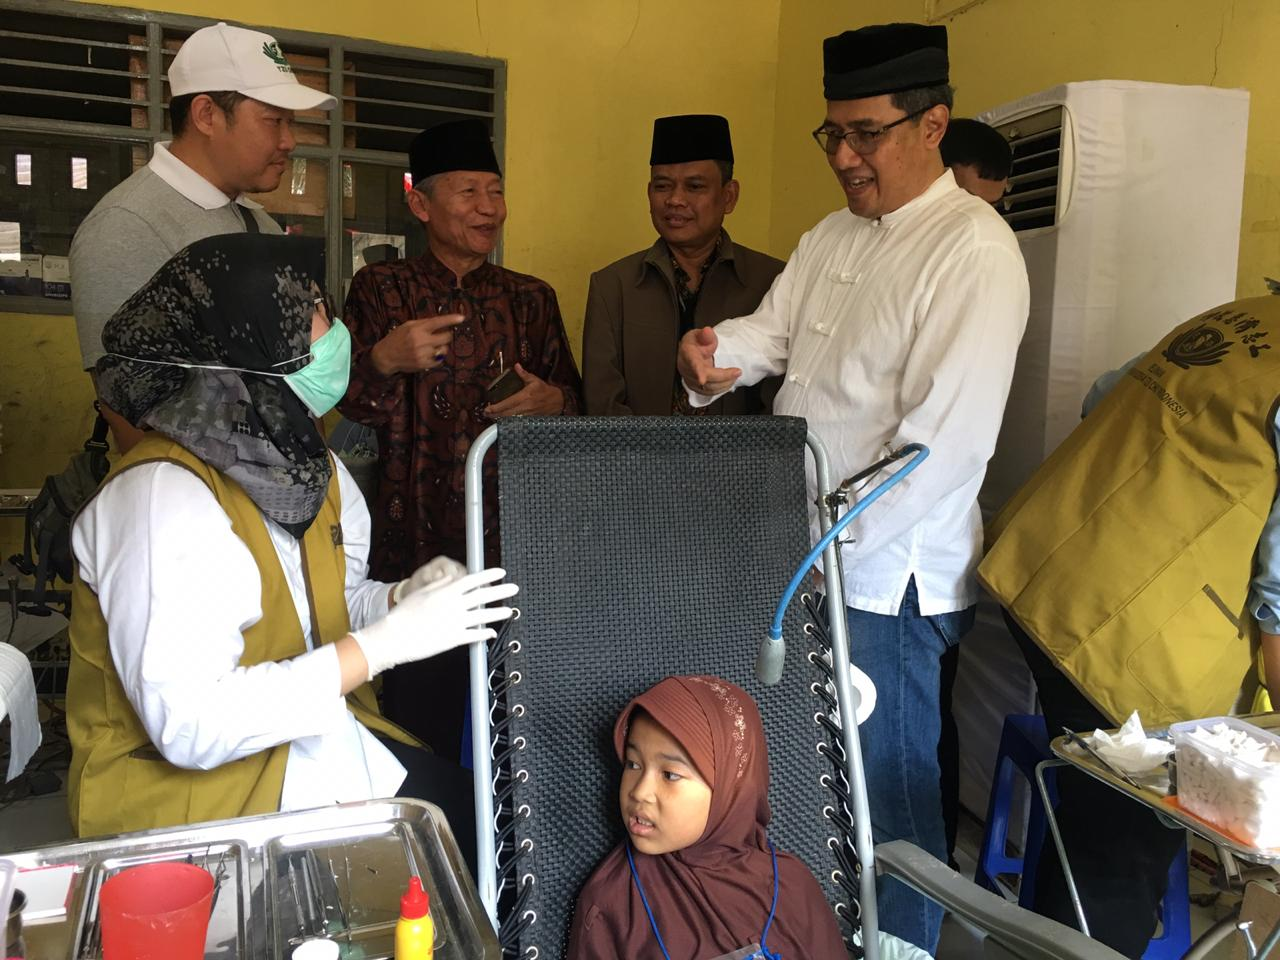 Dhony Rahajoe, Managing Director President Office Sinar Mas Land saat memberikan bantuan kepada warga di kampung Pagerhaur, Desa Pagedangan, Kecamatan Pagedangan, Kabupaten Tangerang.